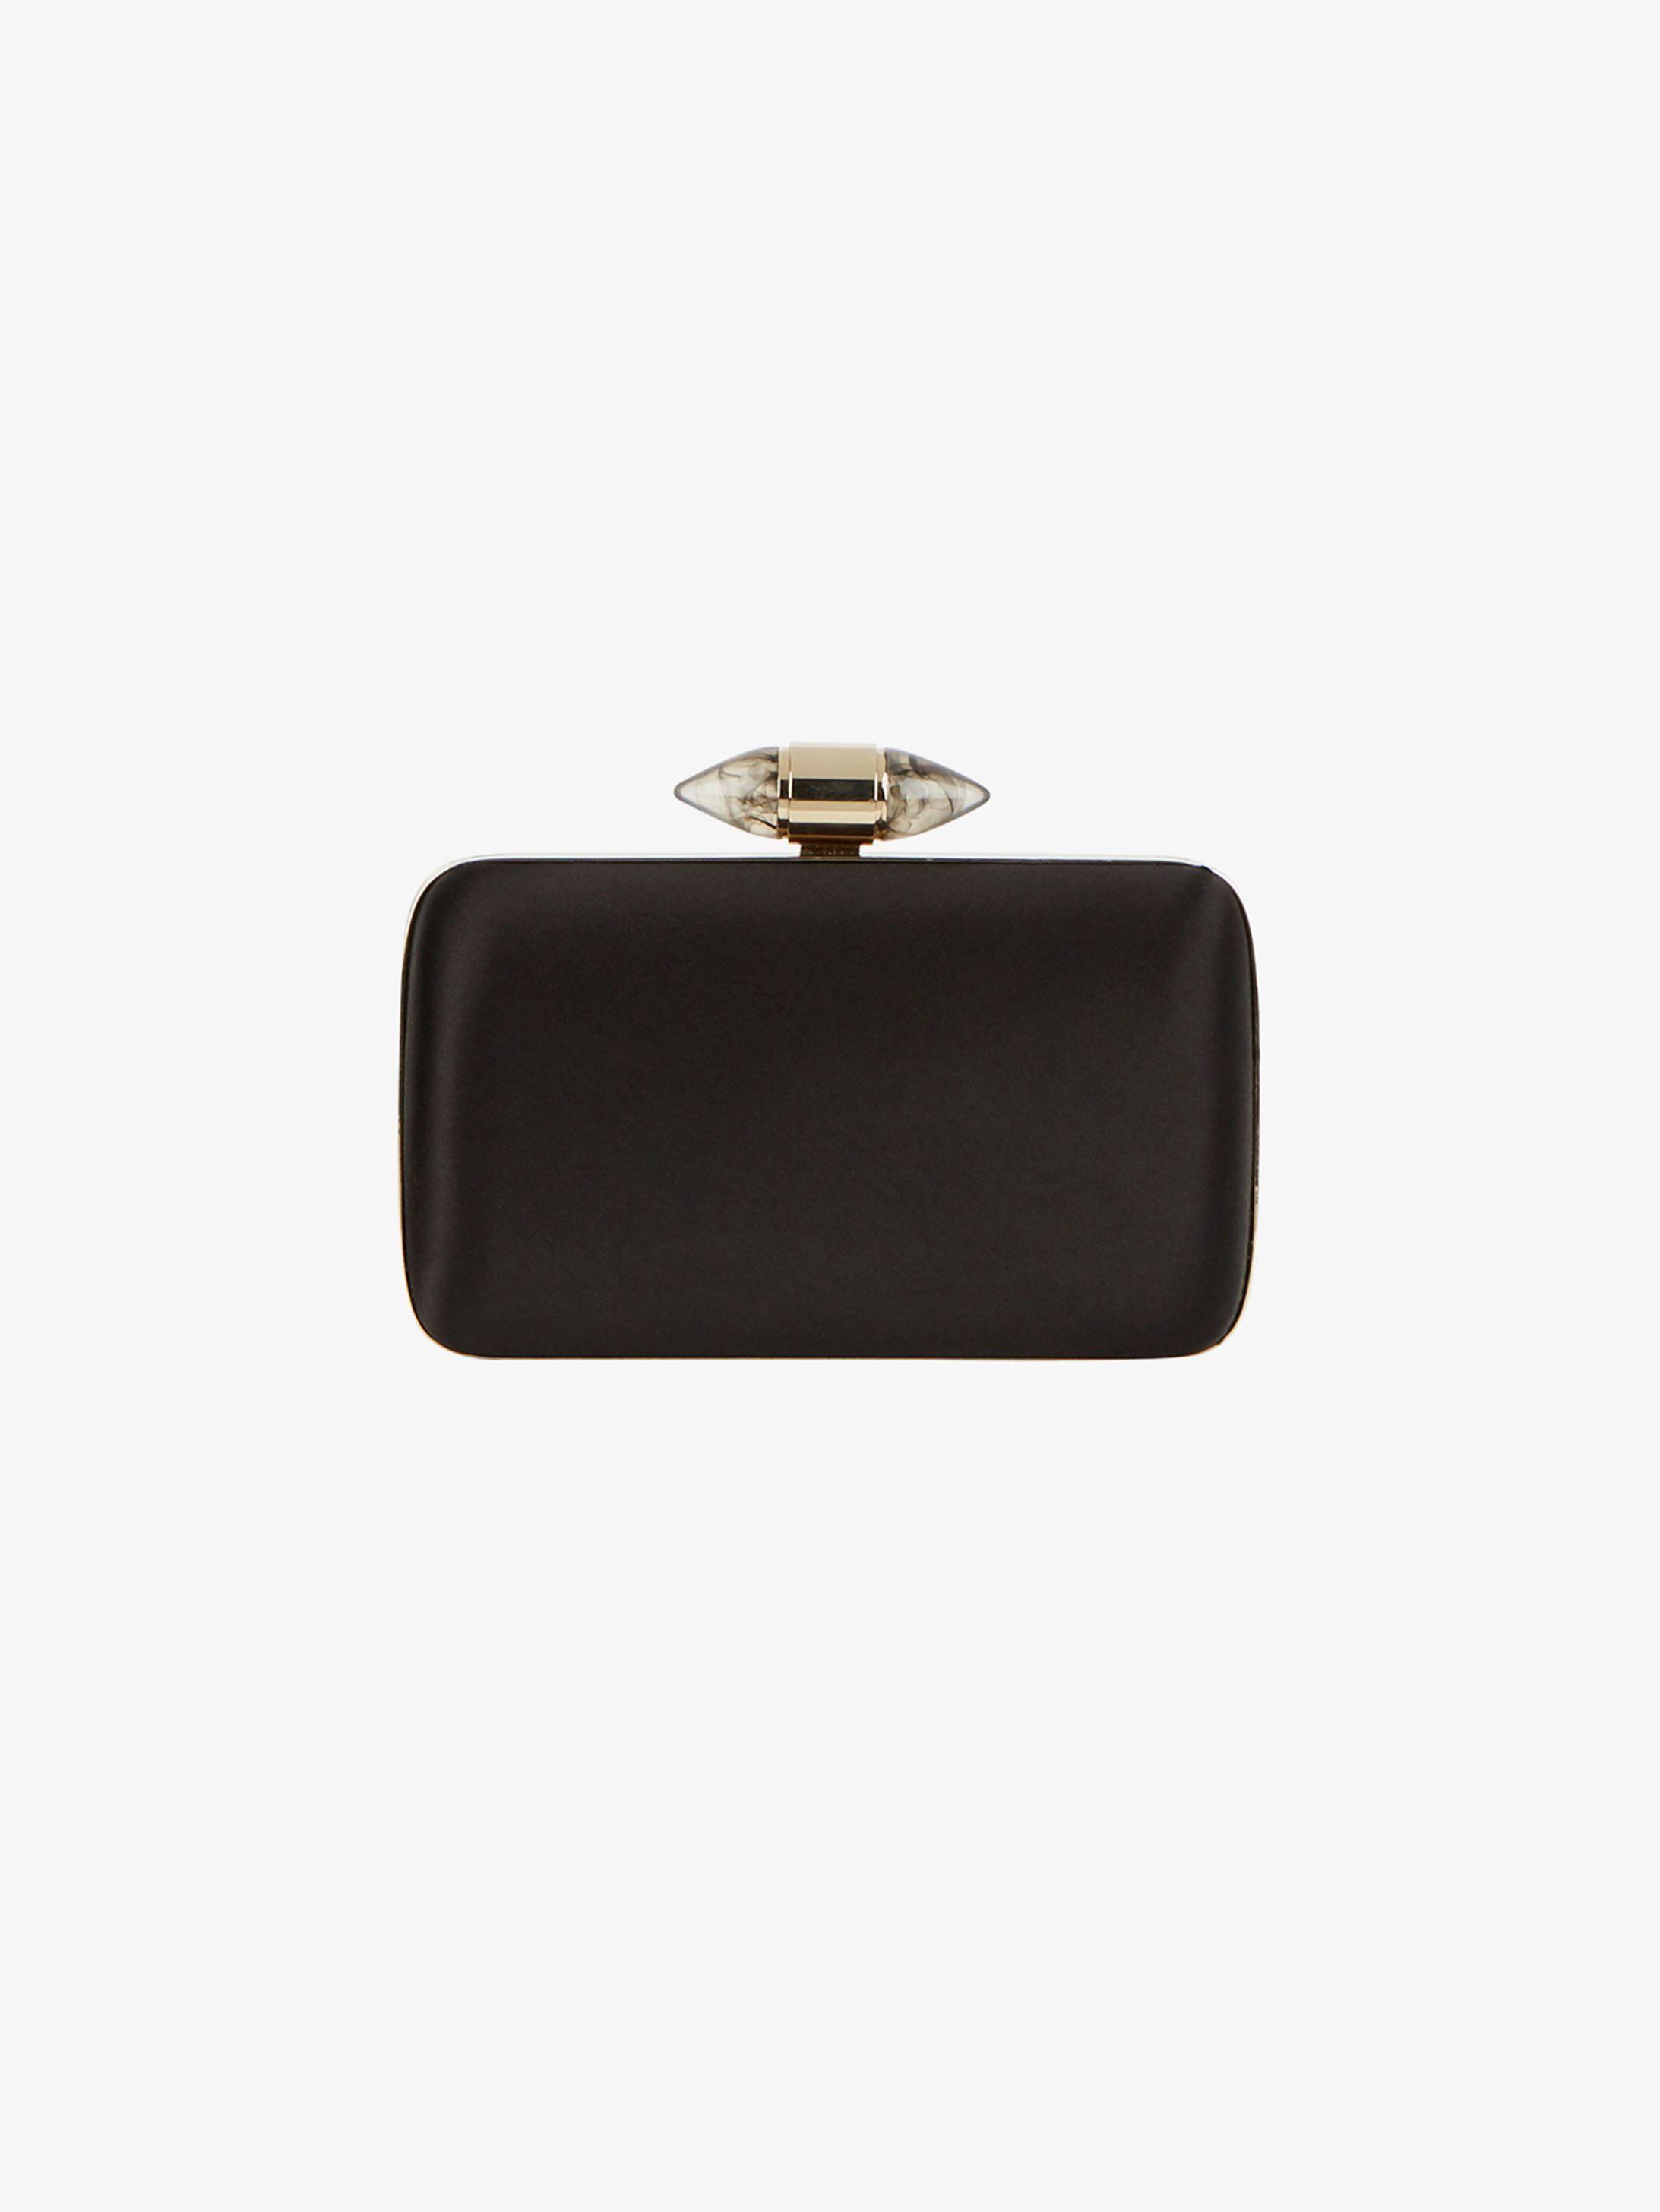 Givenchy Black Satin Clutch with Jewel Clasp..  Givenchy  clutch  purse   satin  accessorise  MeghanMarkle  MarkleSparkle DuchessofSussex   RoyalVisit2018 ... b2fb6e5769289